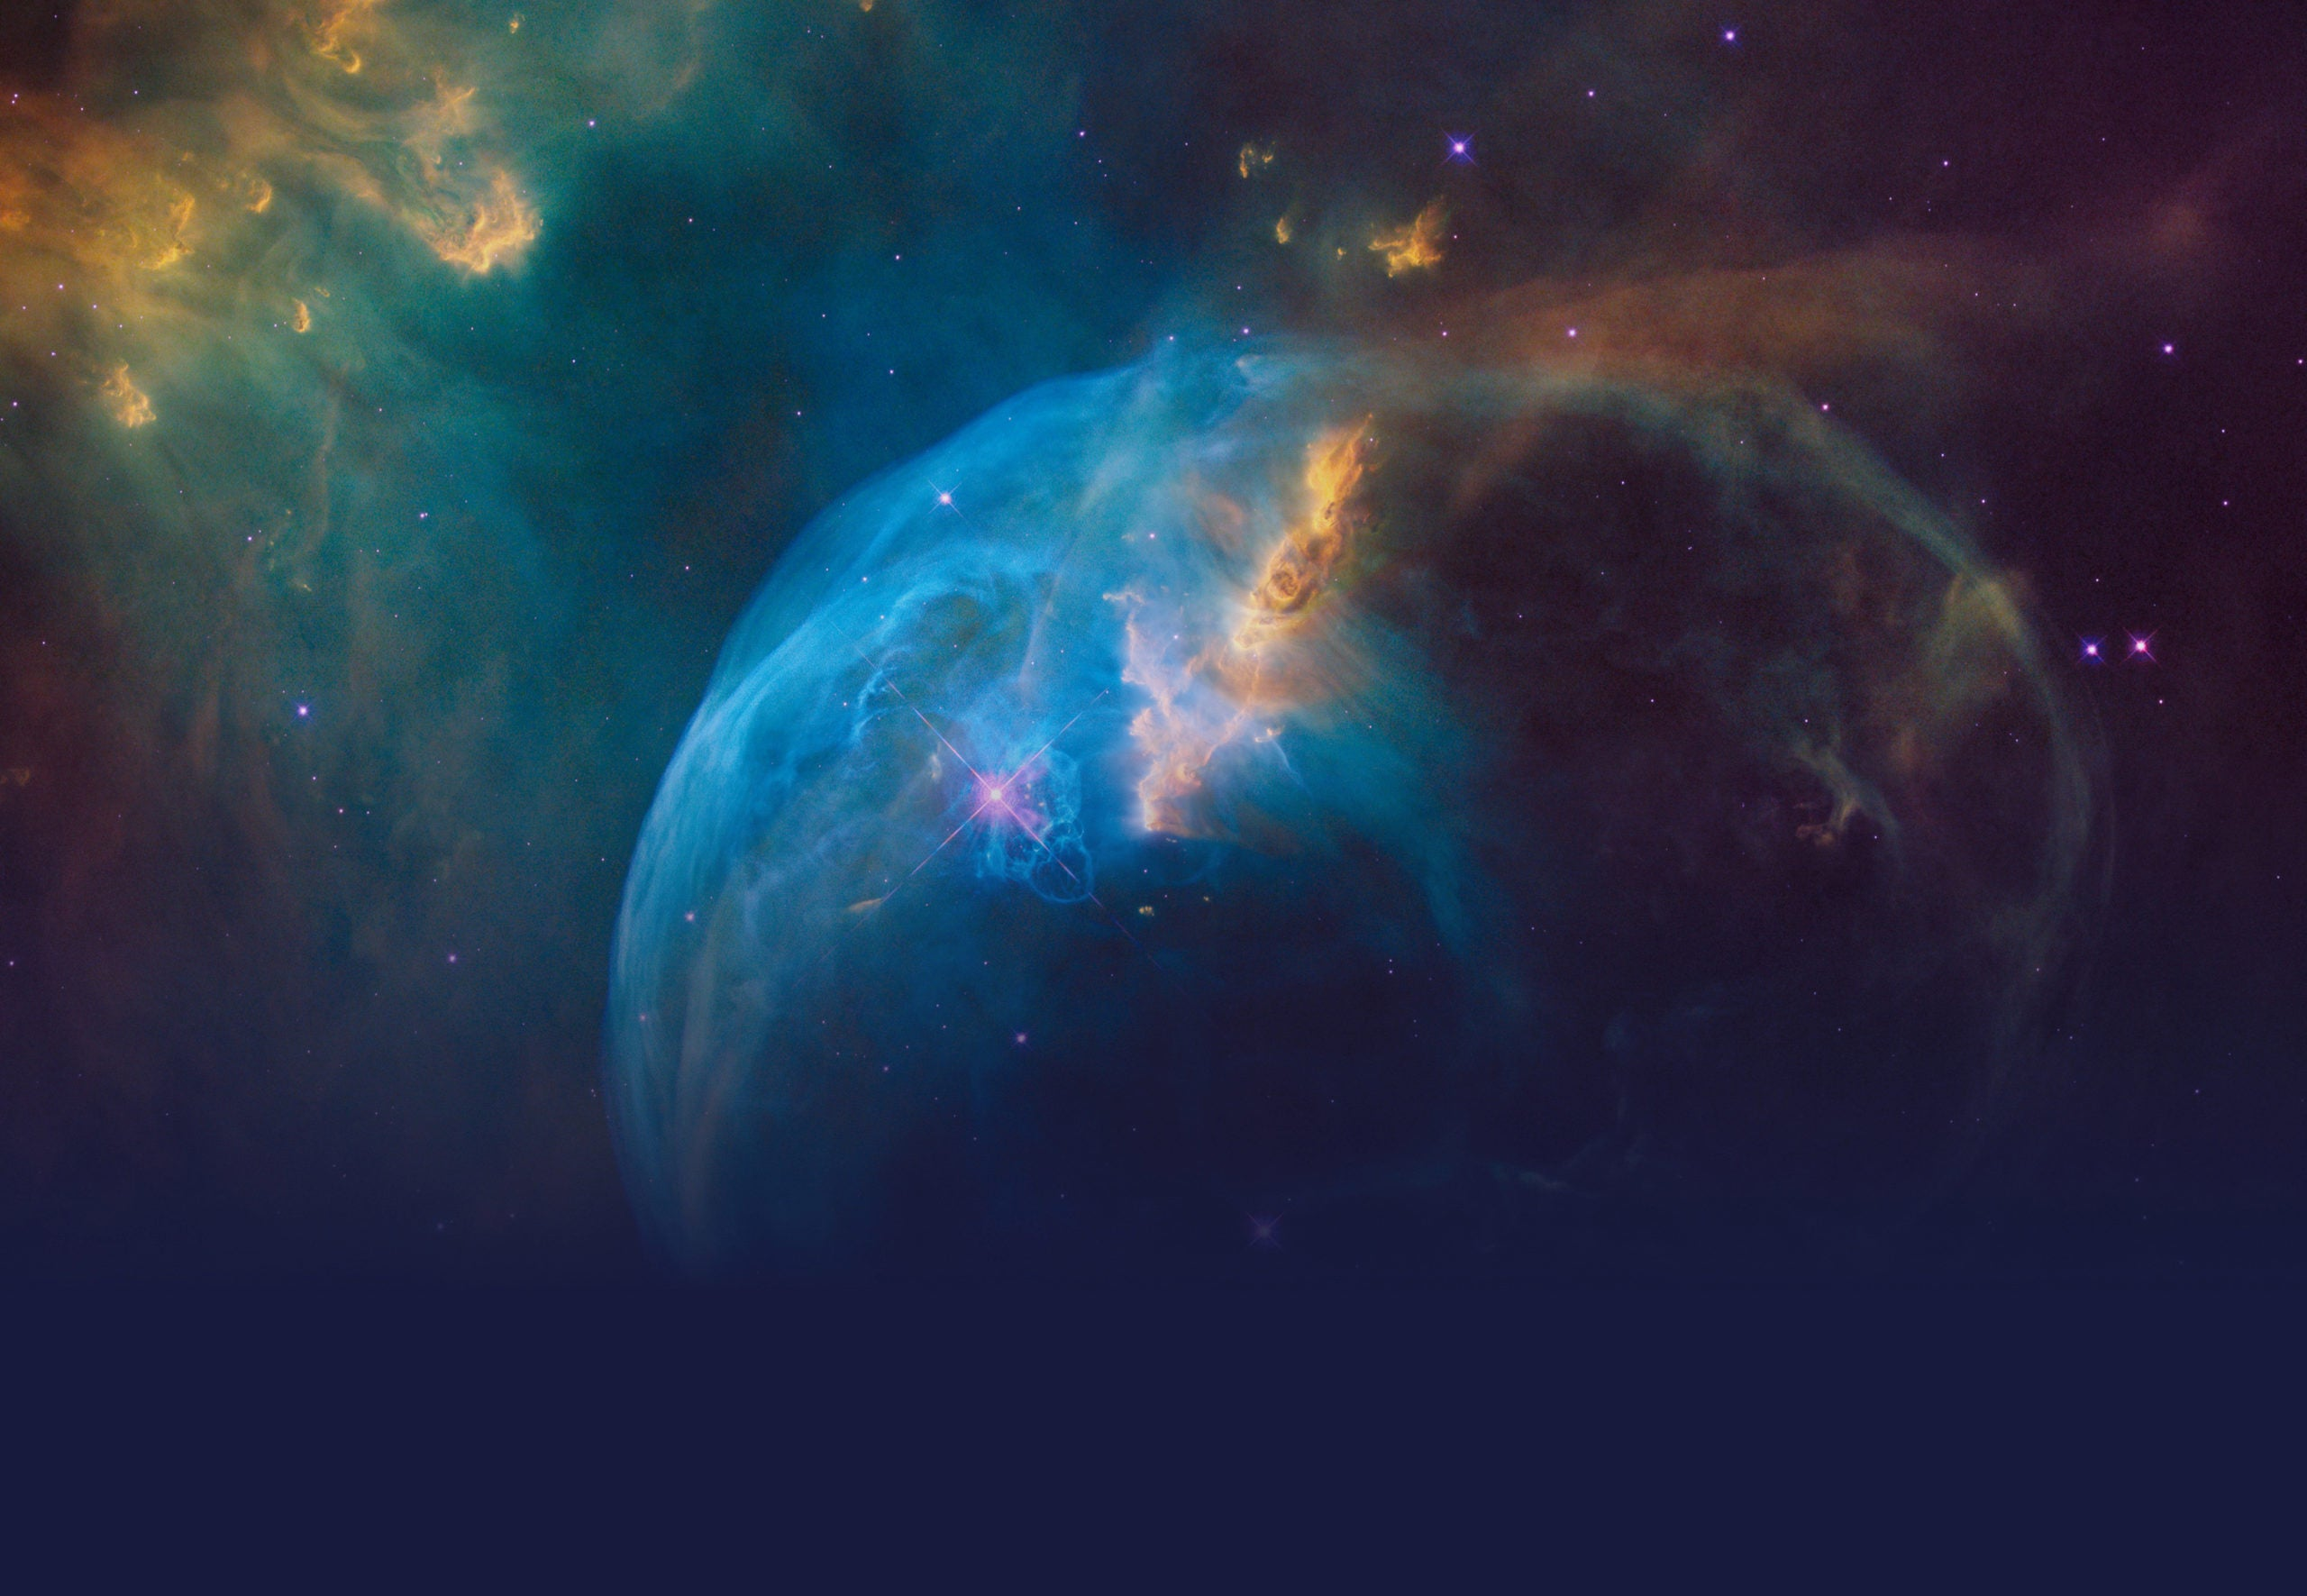 Infinity background image